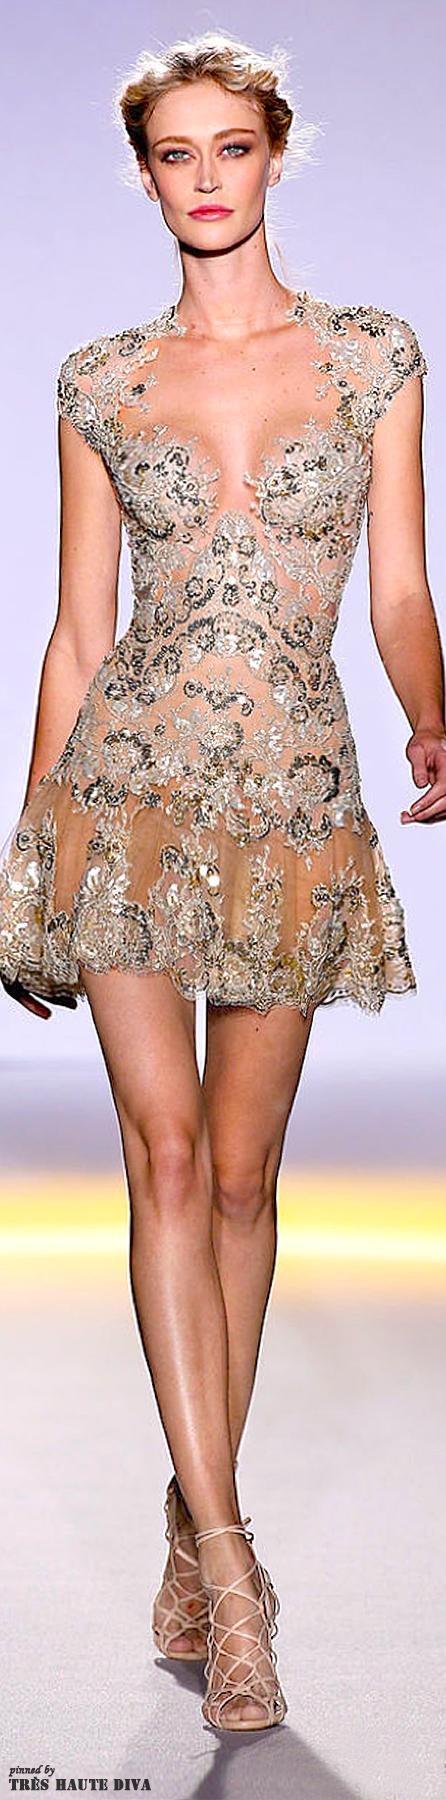 Gala weekend:  Zuhair Murad S/S 2013 Couture